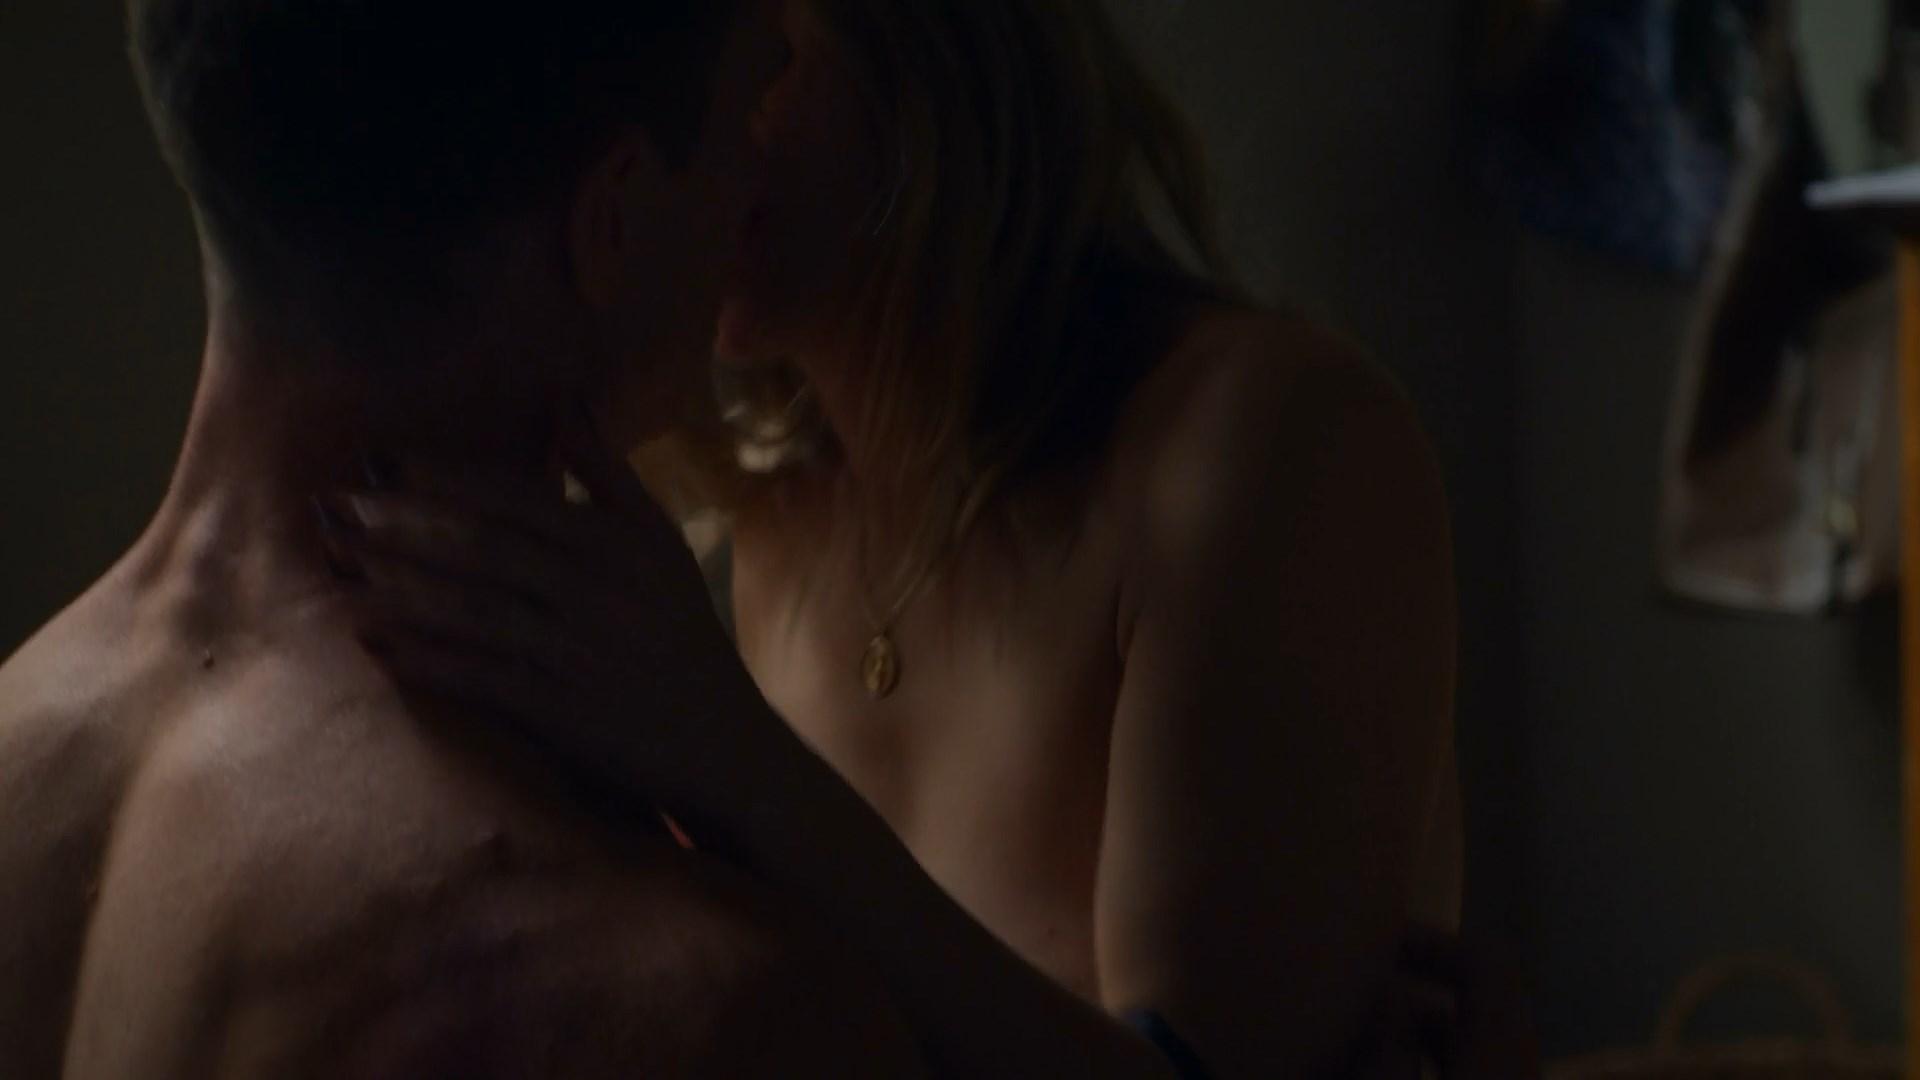 Kristen Bell sex video Murzynki Cycki Tube